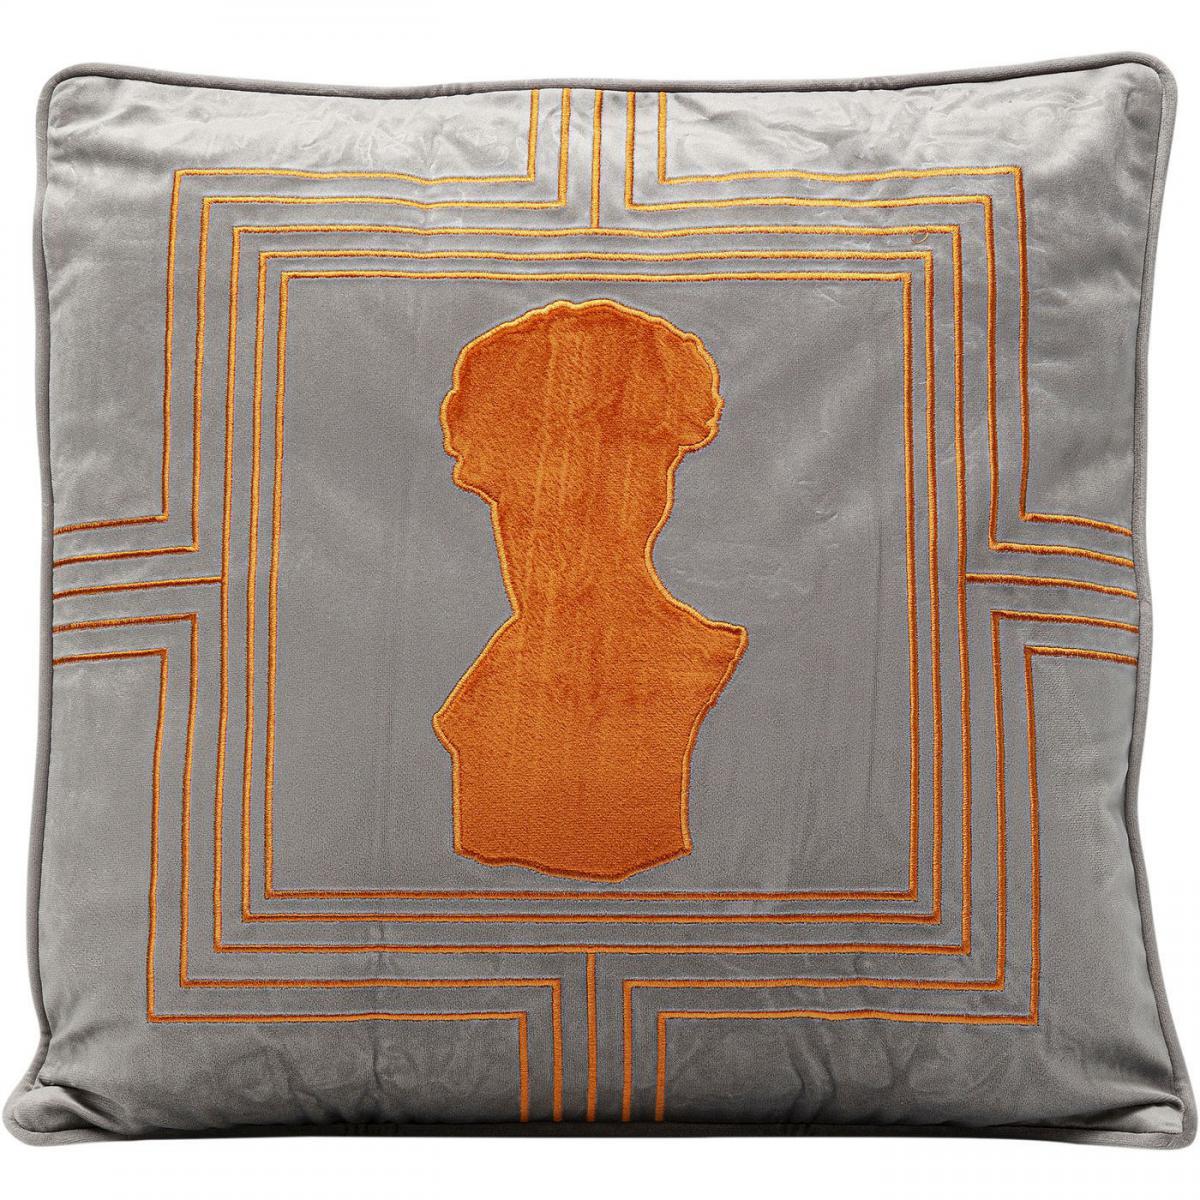 Karedesign Coussin buste orange 45x45cm Kare Design